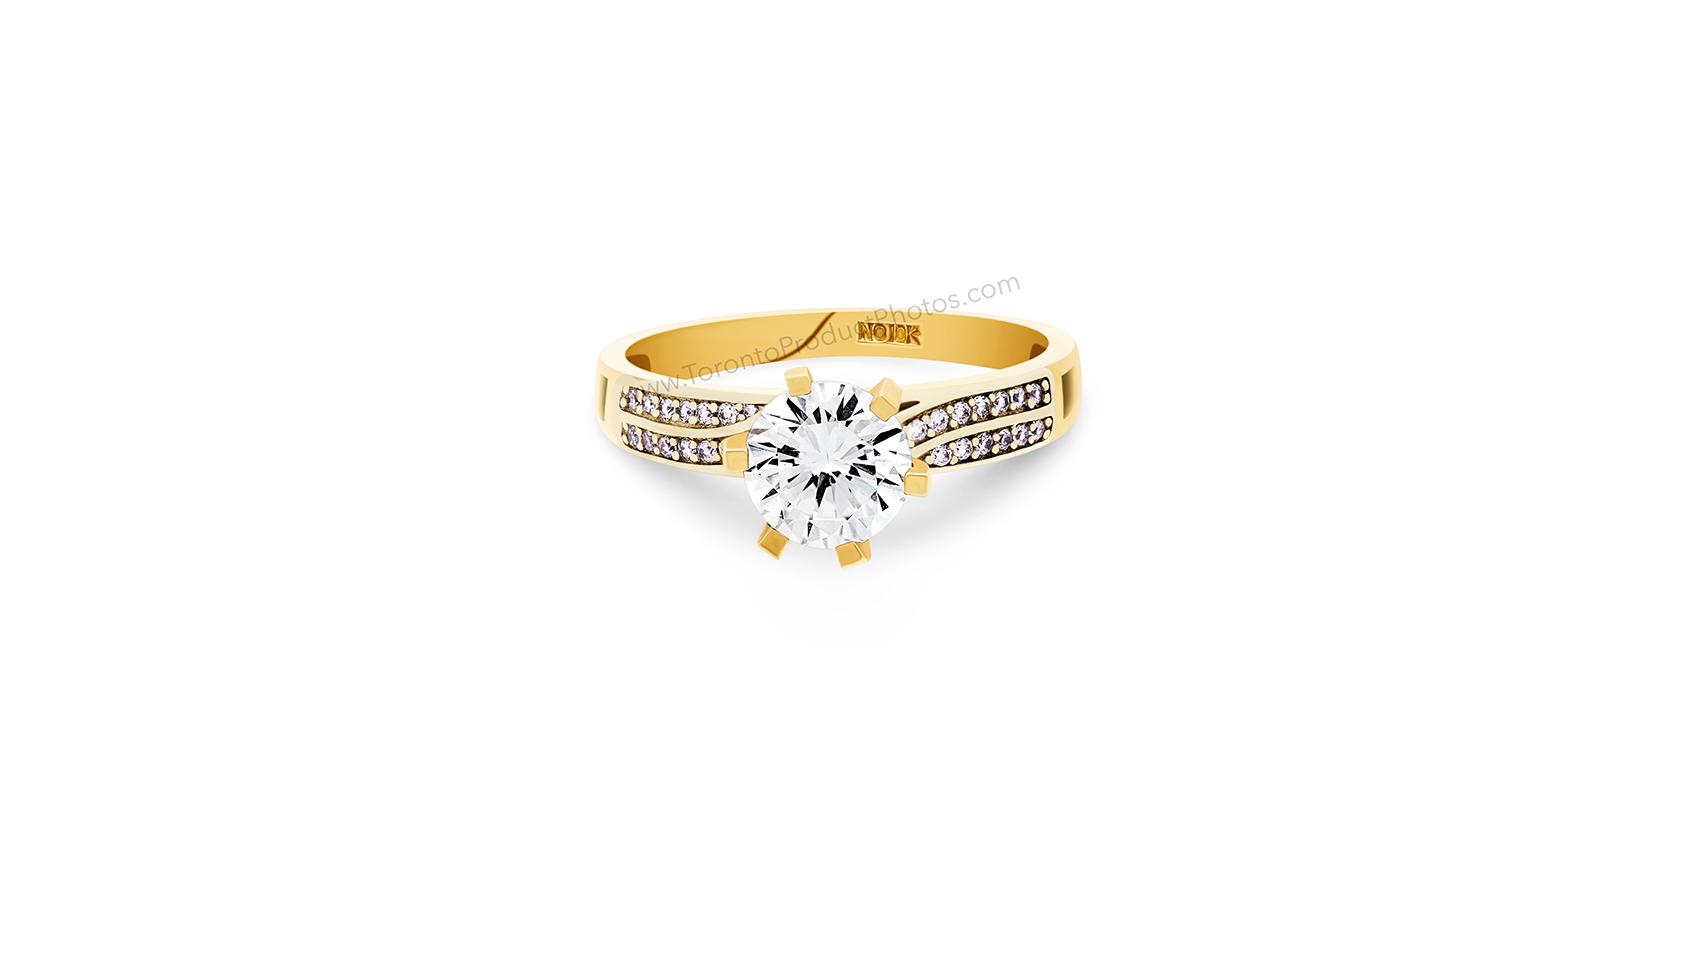 Mississauga Product Photography - Diamond Ring